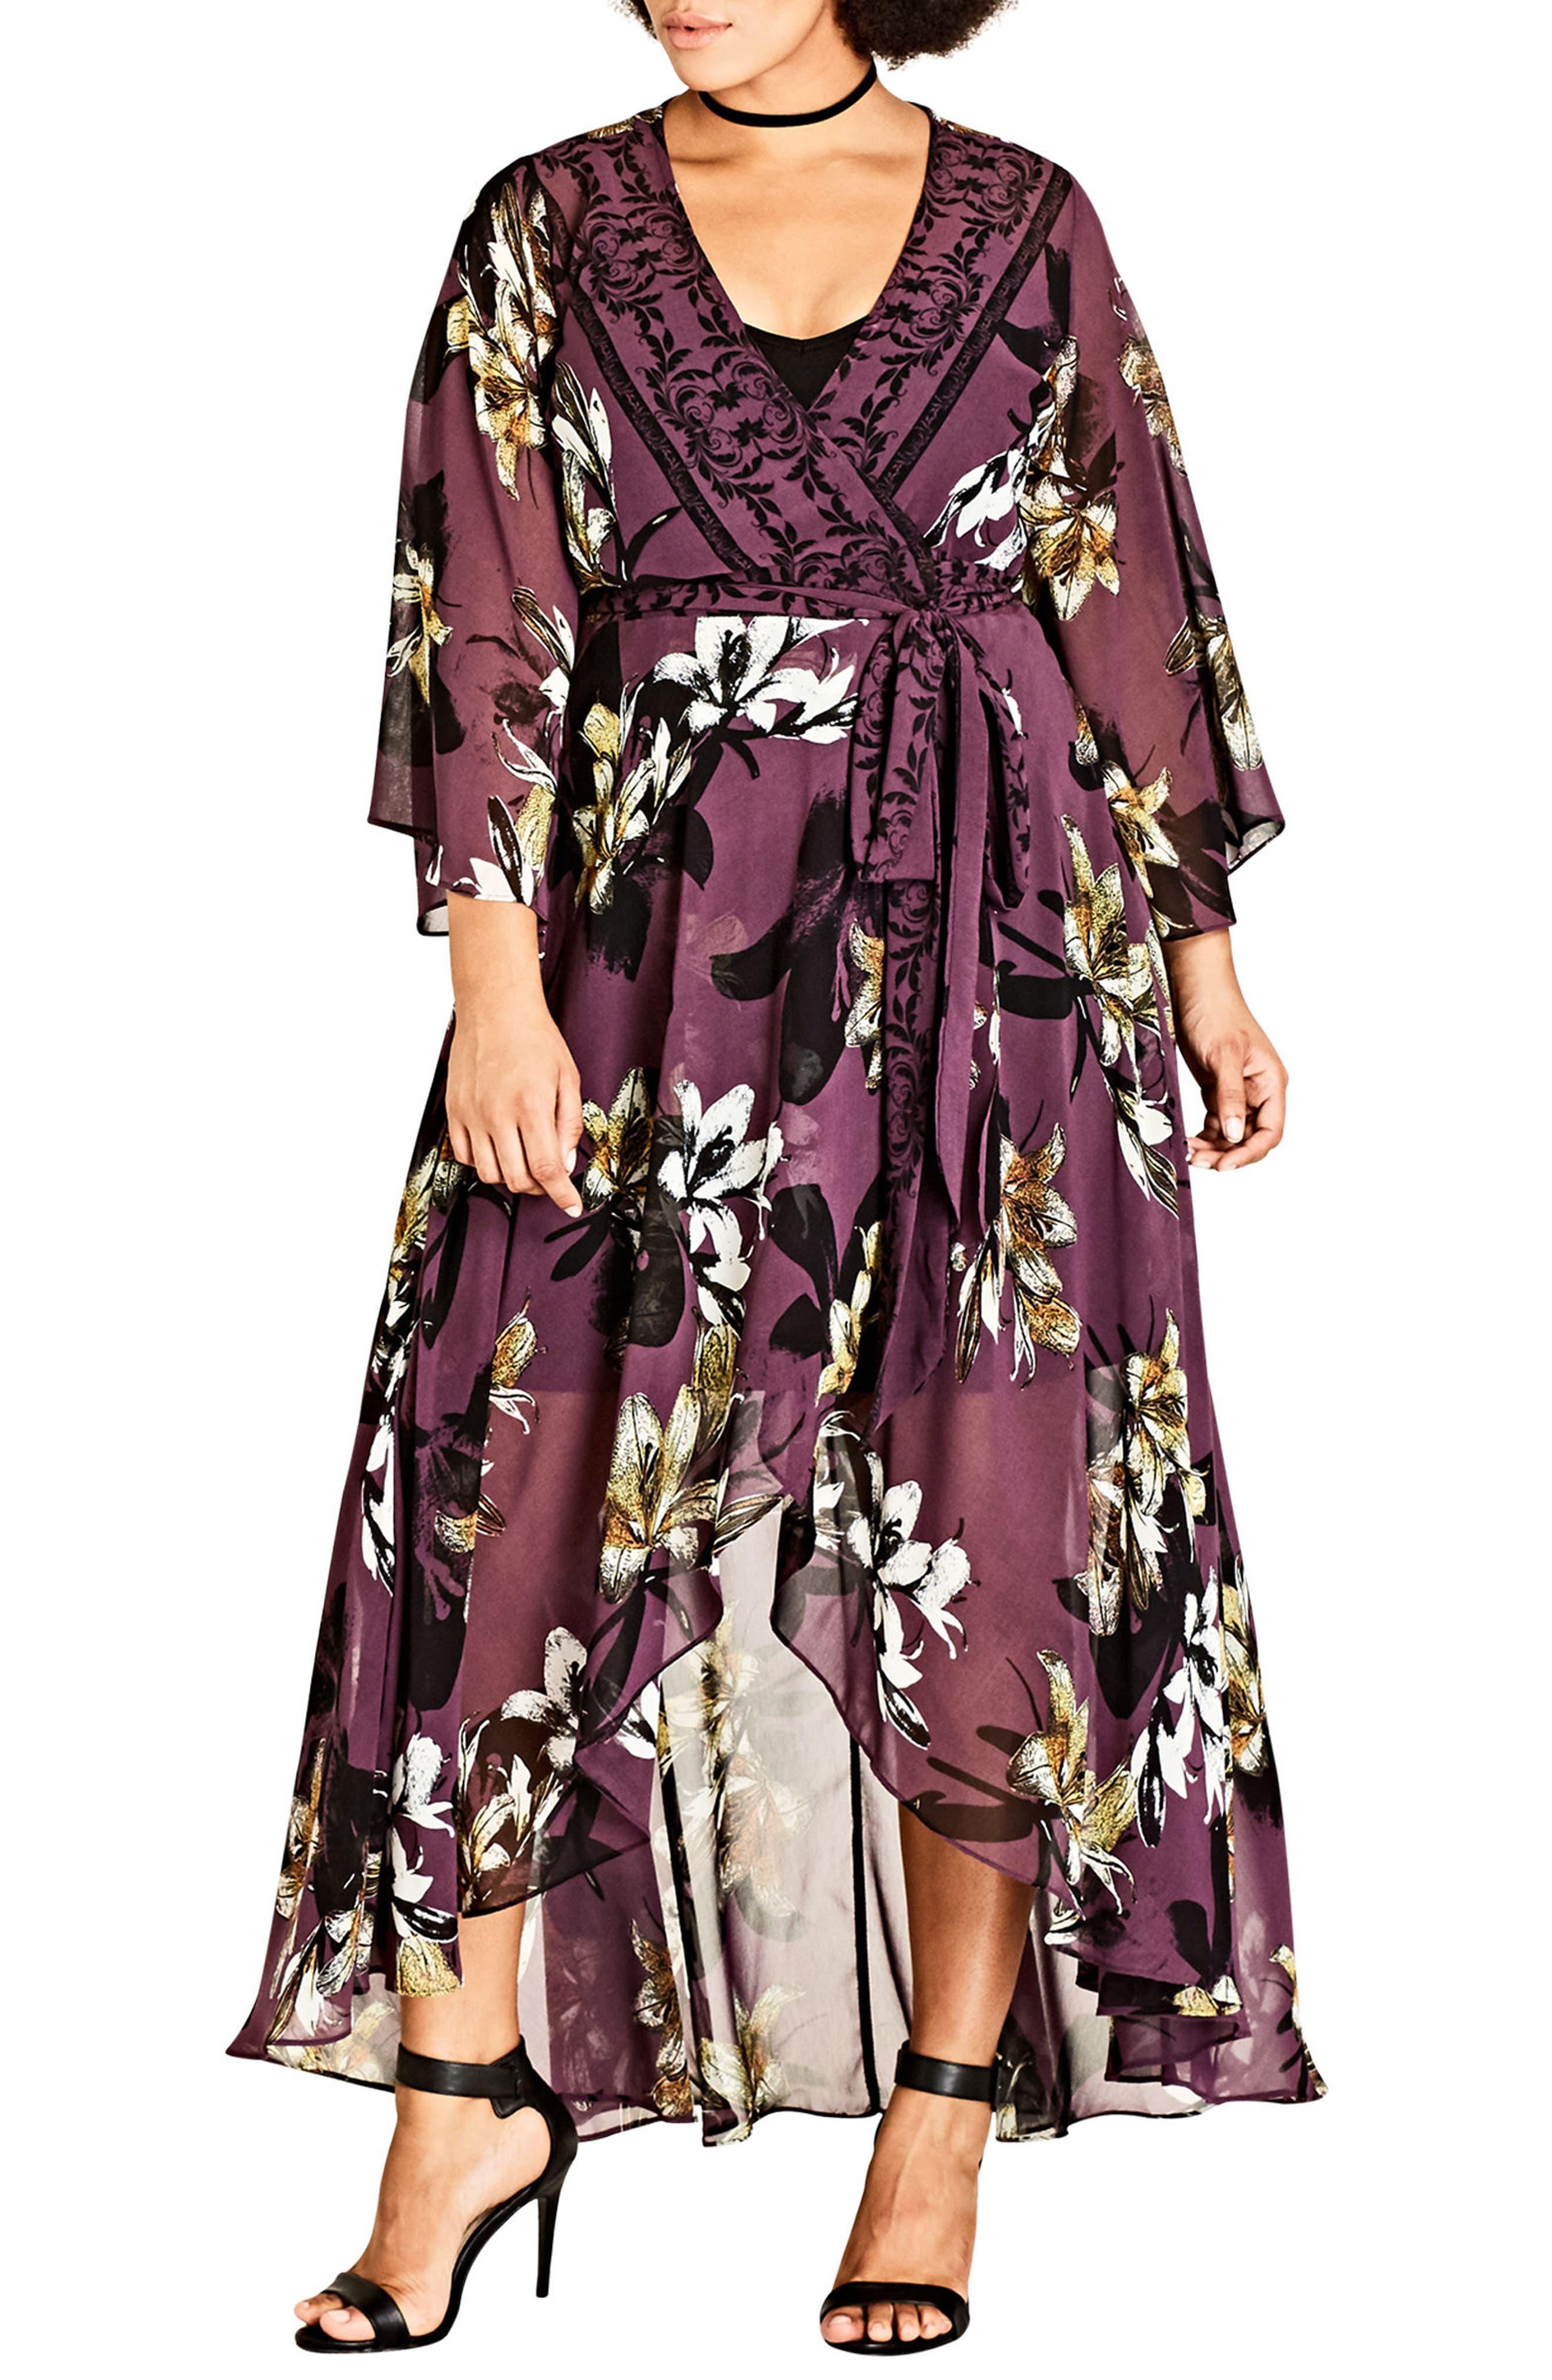 Burgundy Lily Maxi Dress,                             Main thumbnail 1, color,                             Burgundy Lily